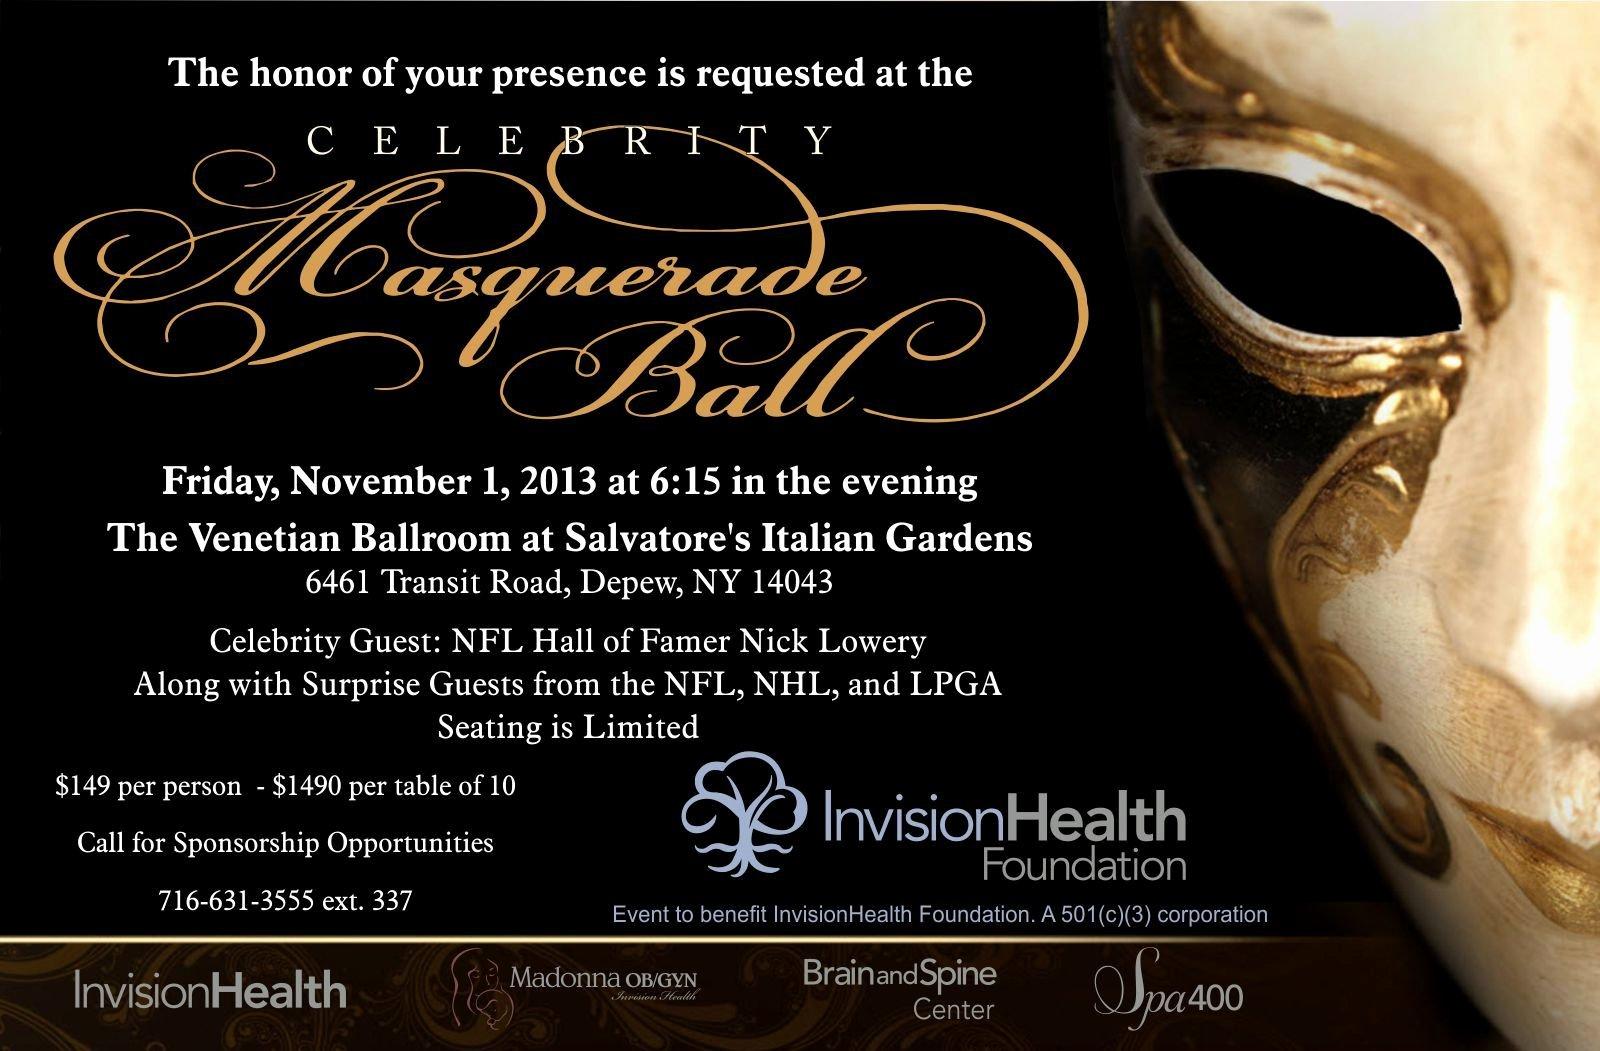 Masquerade Ball Invitations Free Templates Best Of for Blank Masquerade Ball Invitations event Planning